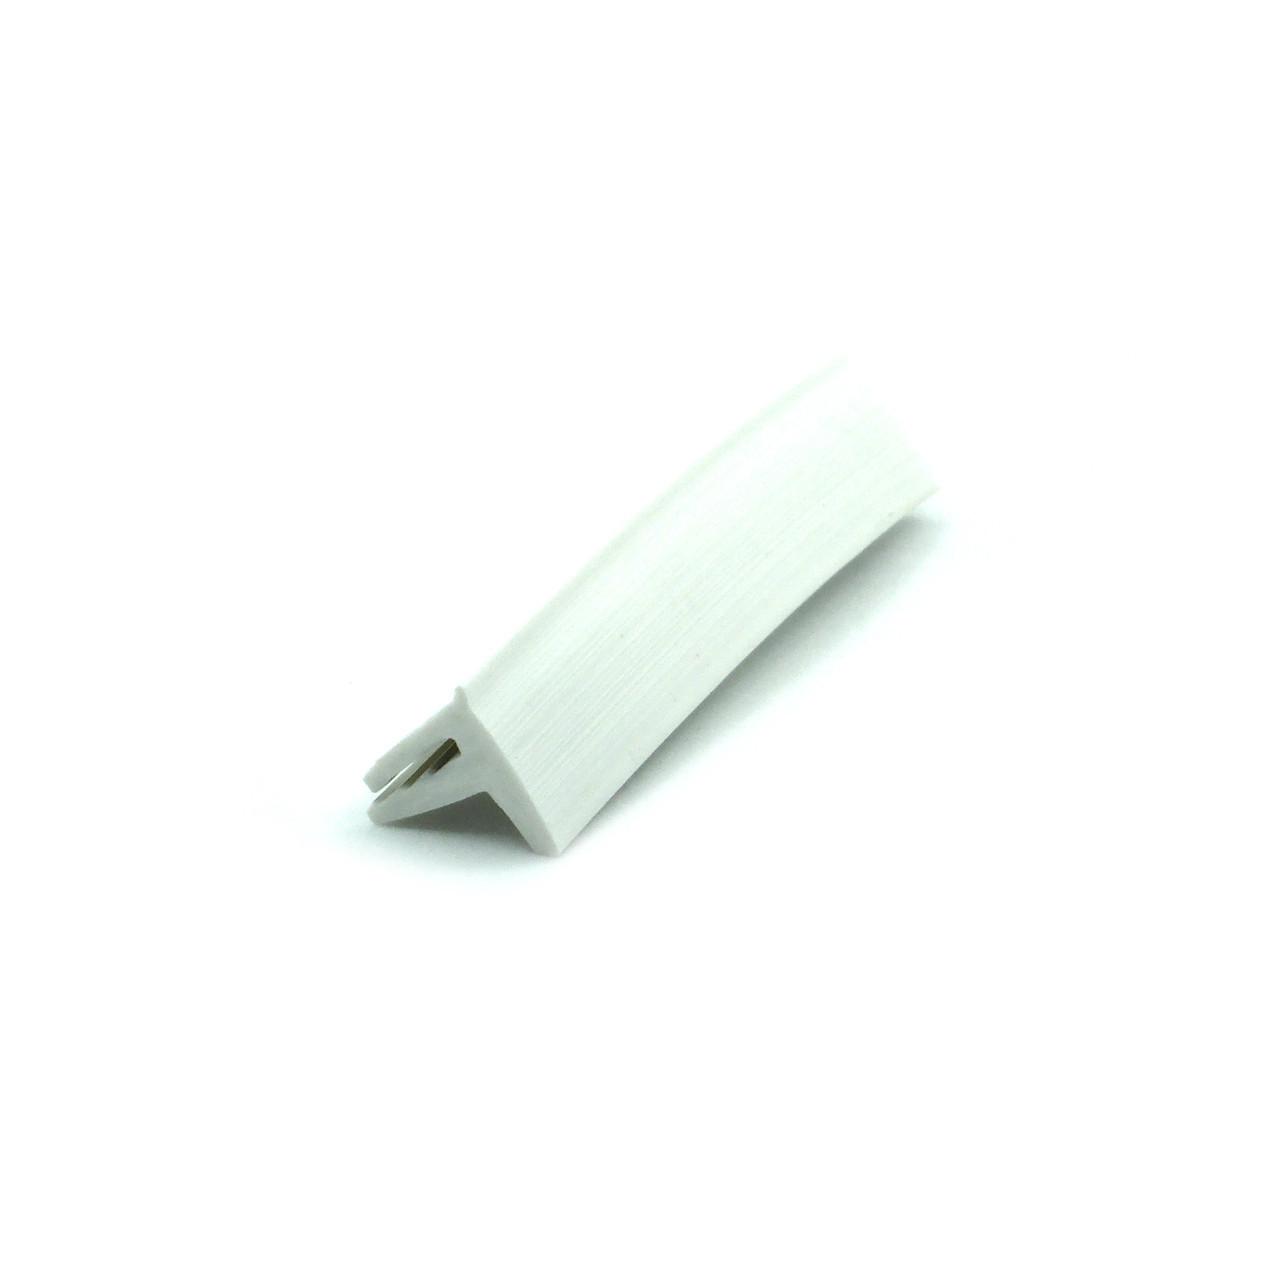 Вставка заглушка декоративная для натяжного потолка №1 (ширина 10 мм, матовая, 2 зуба)